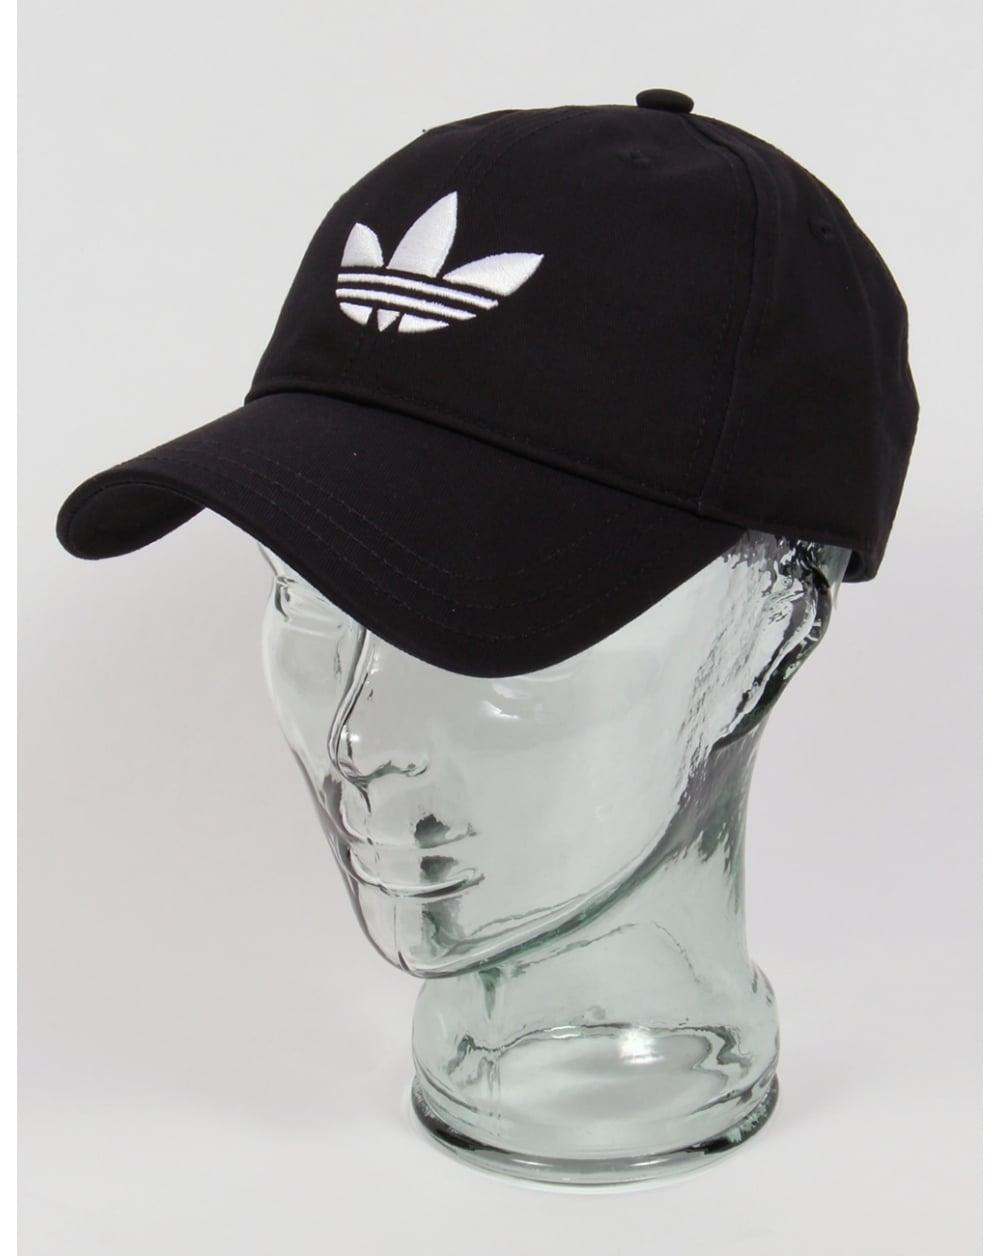 d44056589ff702 Adidas Originals Trefoil Cap Black/White,baseball,hat,mens